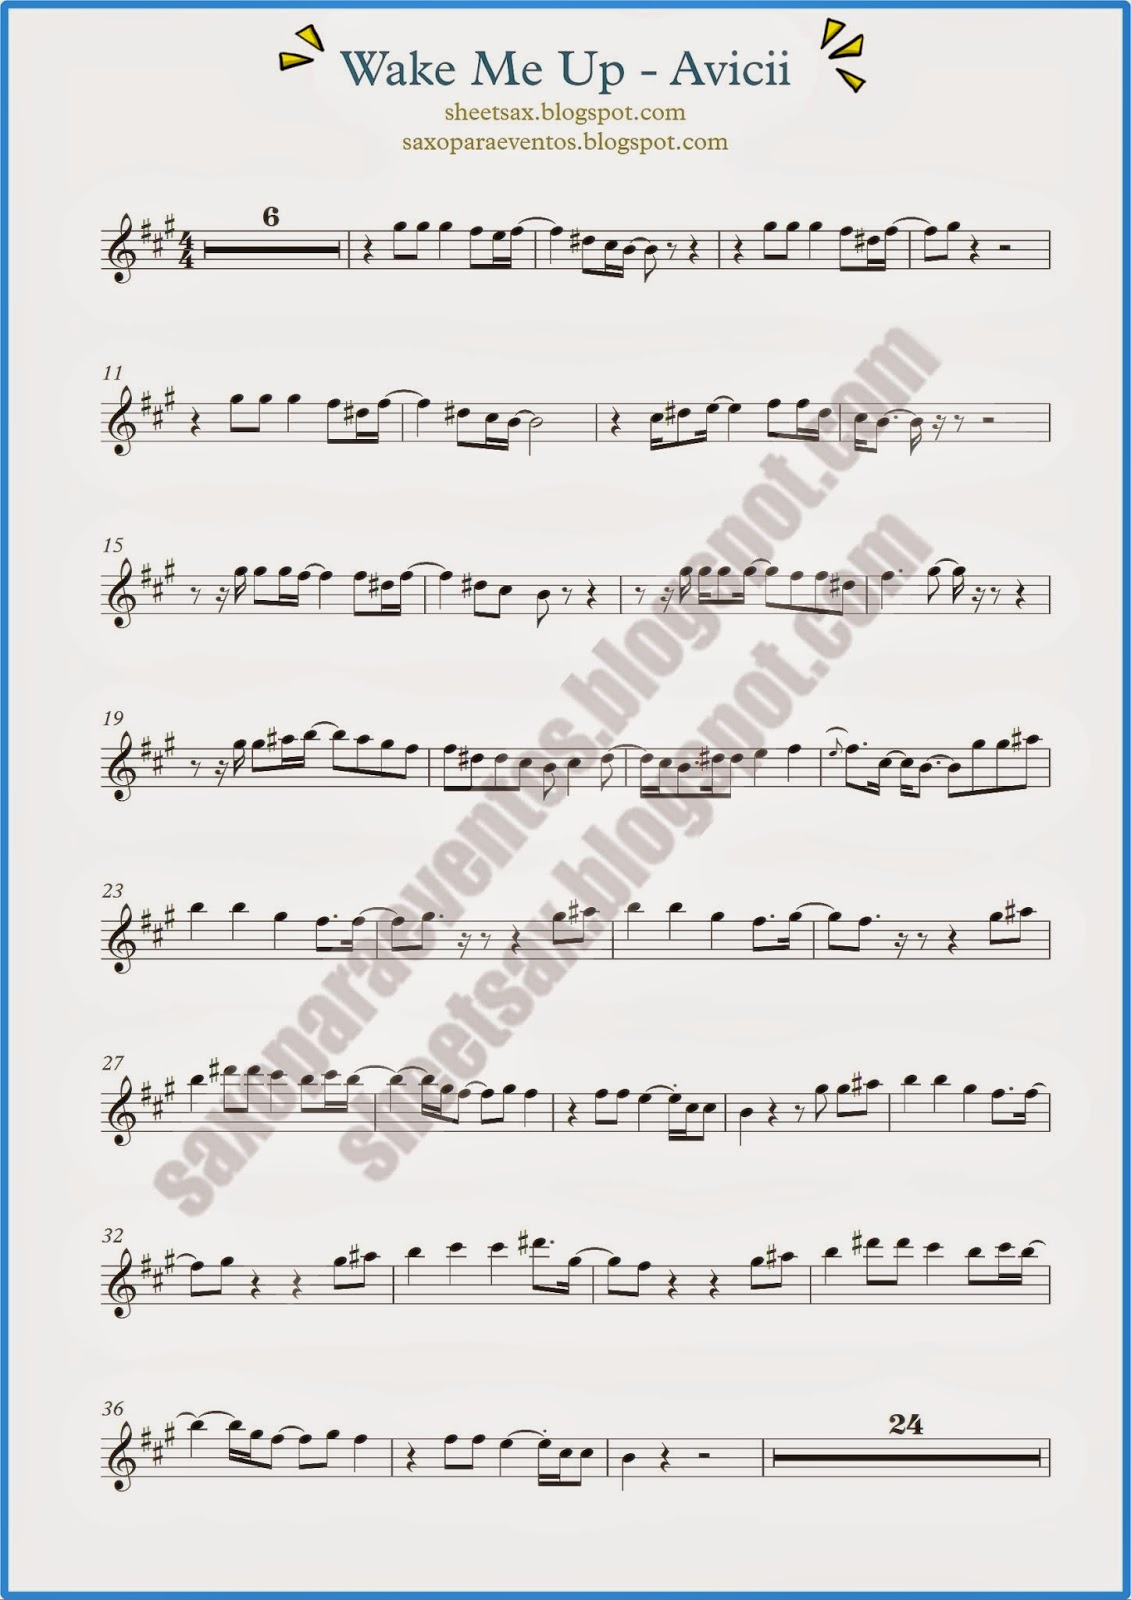 Wake me up by avicii sheet music and playalong for your sheet music of wake me up by avicii for sopranino saxophone alto sax baritone sax sax bass trumpet flugelhorn and cornet in e eb clarinets free sheet hexwebz Gallery